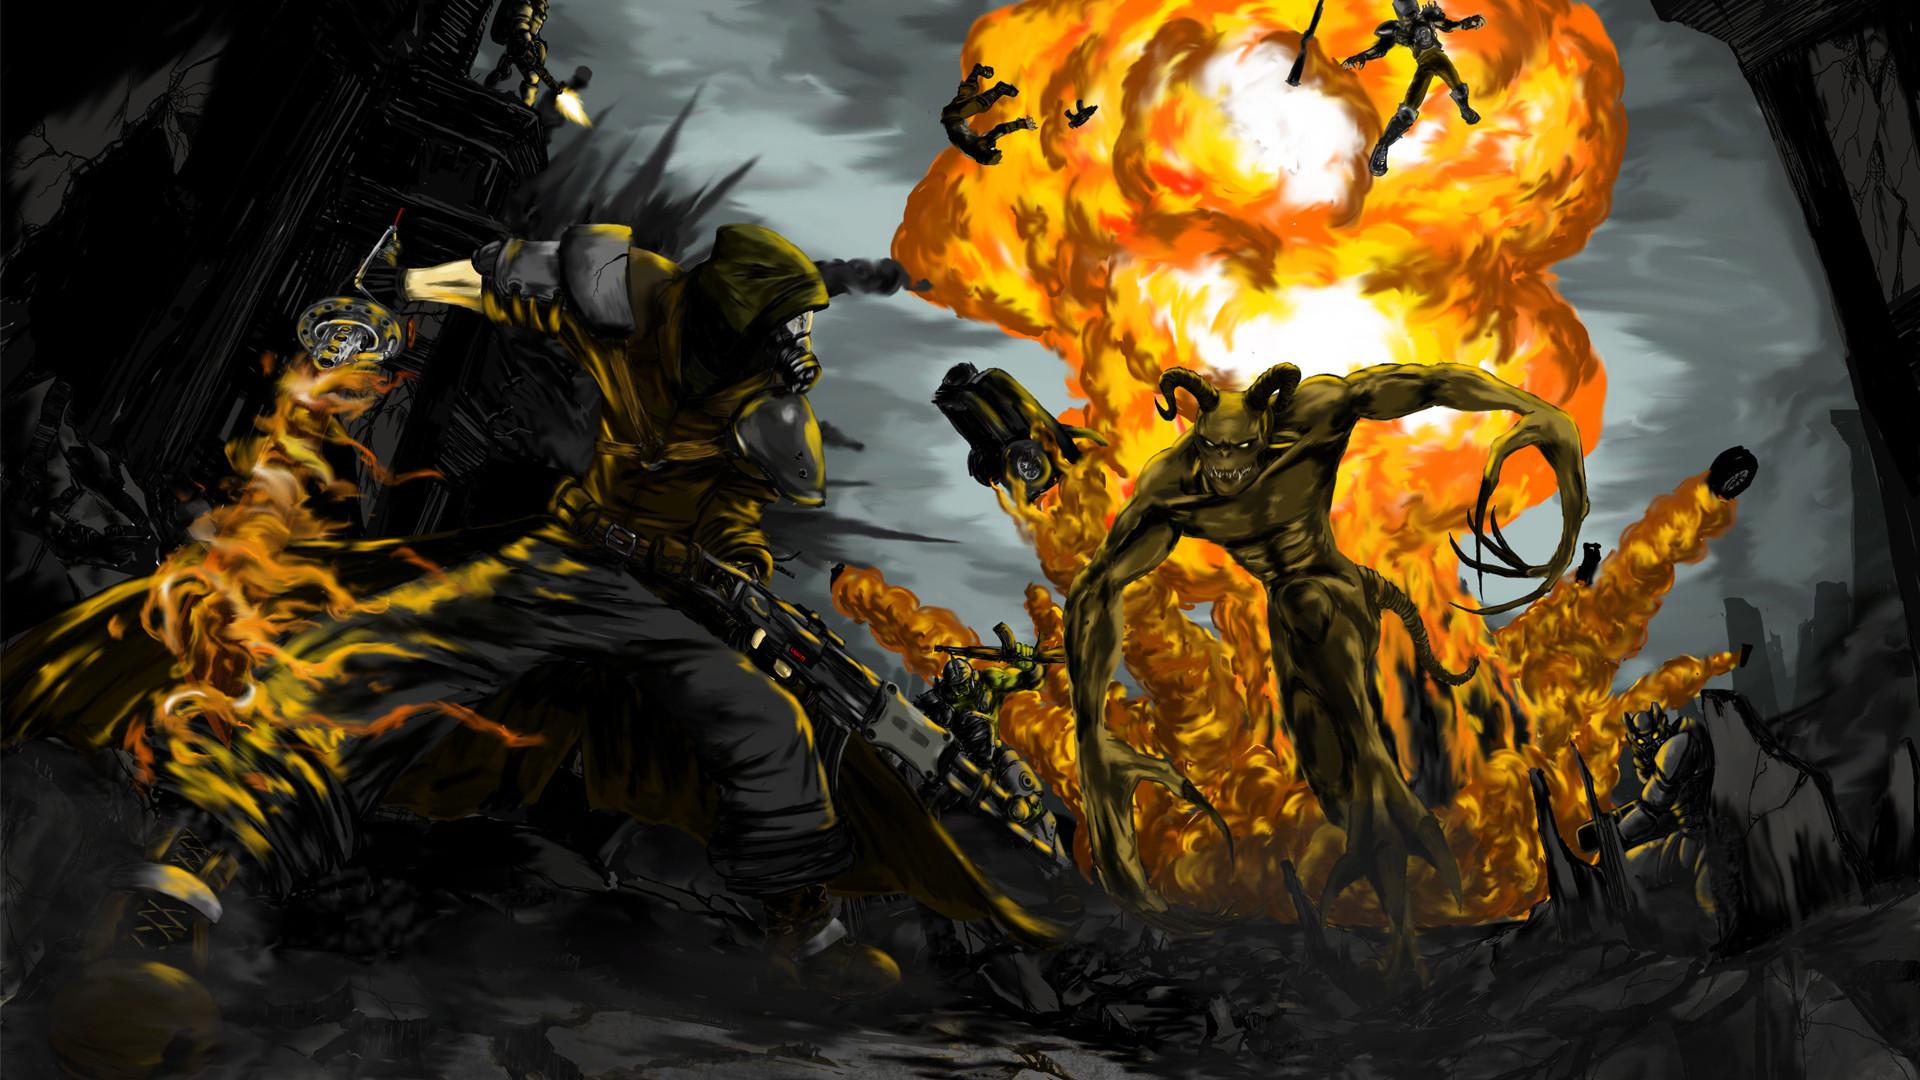 Fallout 3 Computer Wallpapers, Desktop Backgrounds | | ID .